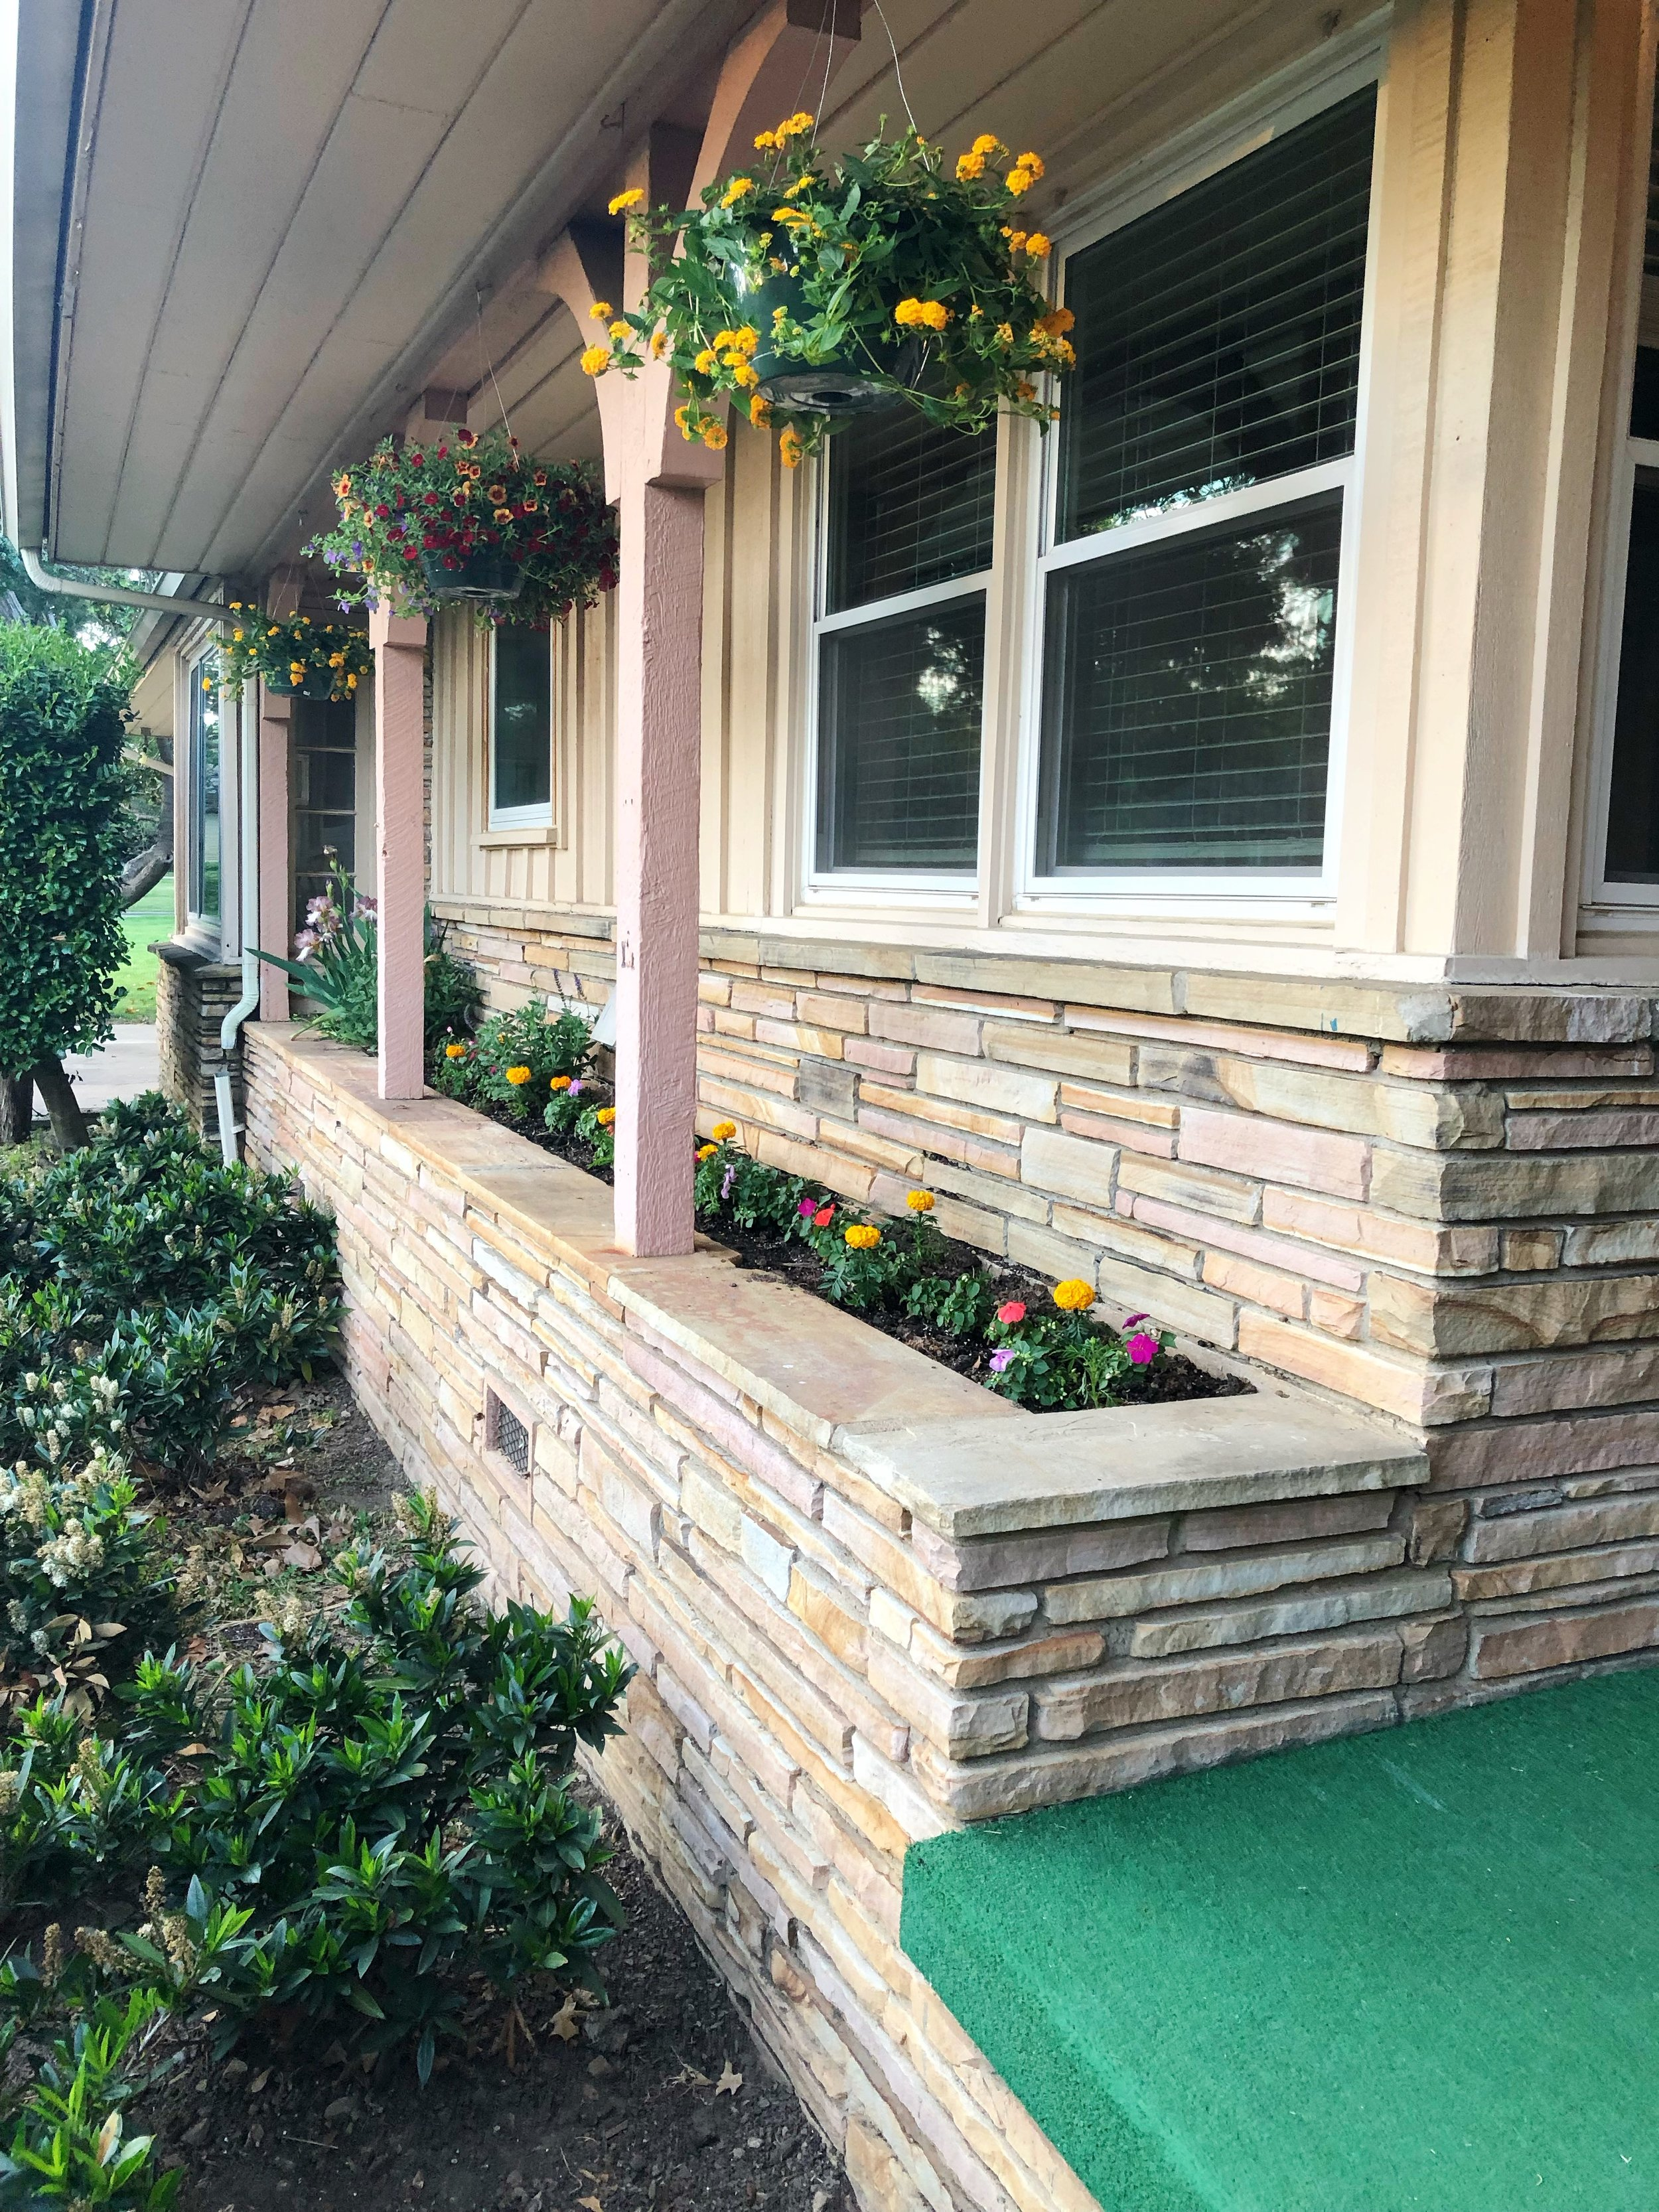 Tulsa midcentury modern home landscaping hanging baskets.jpg